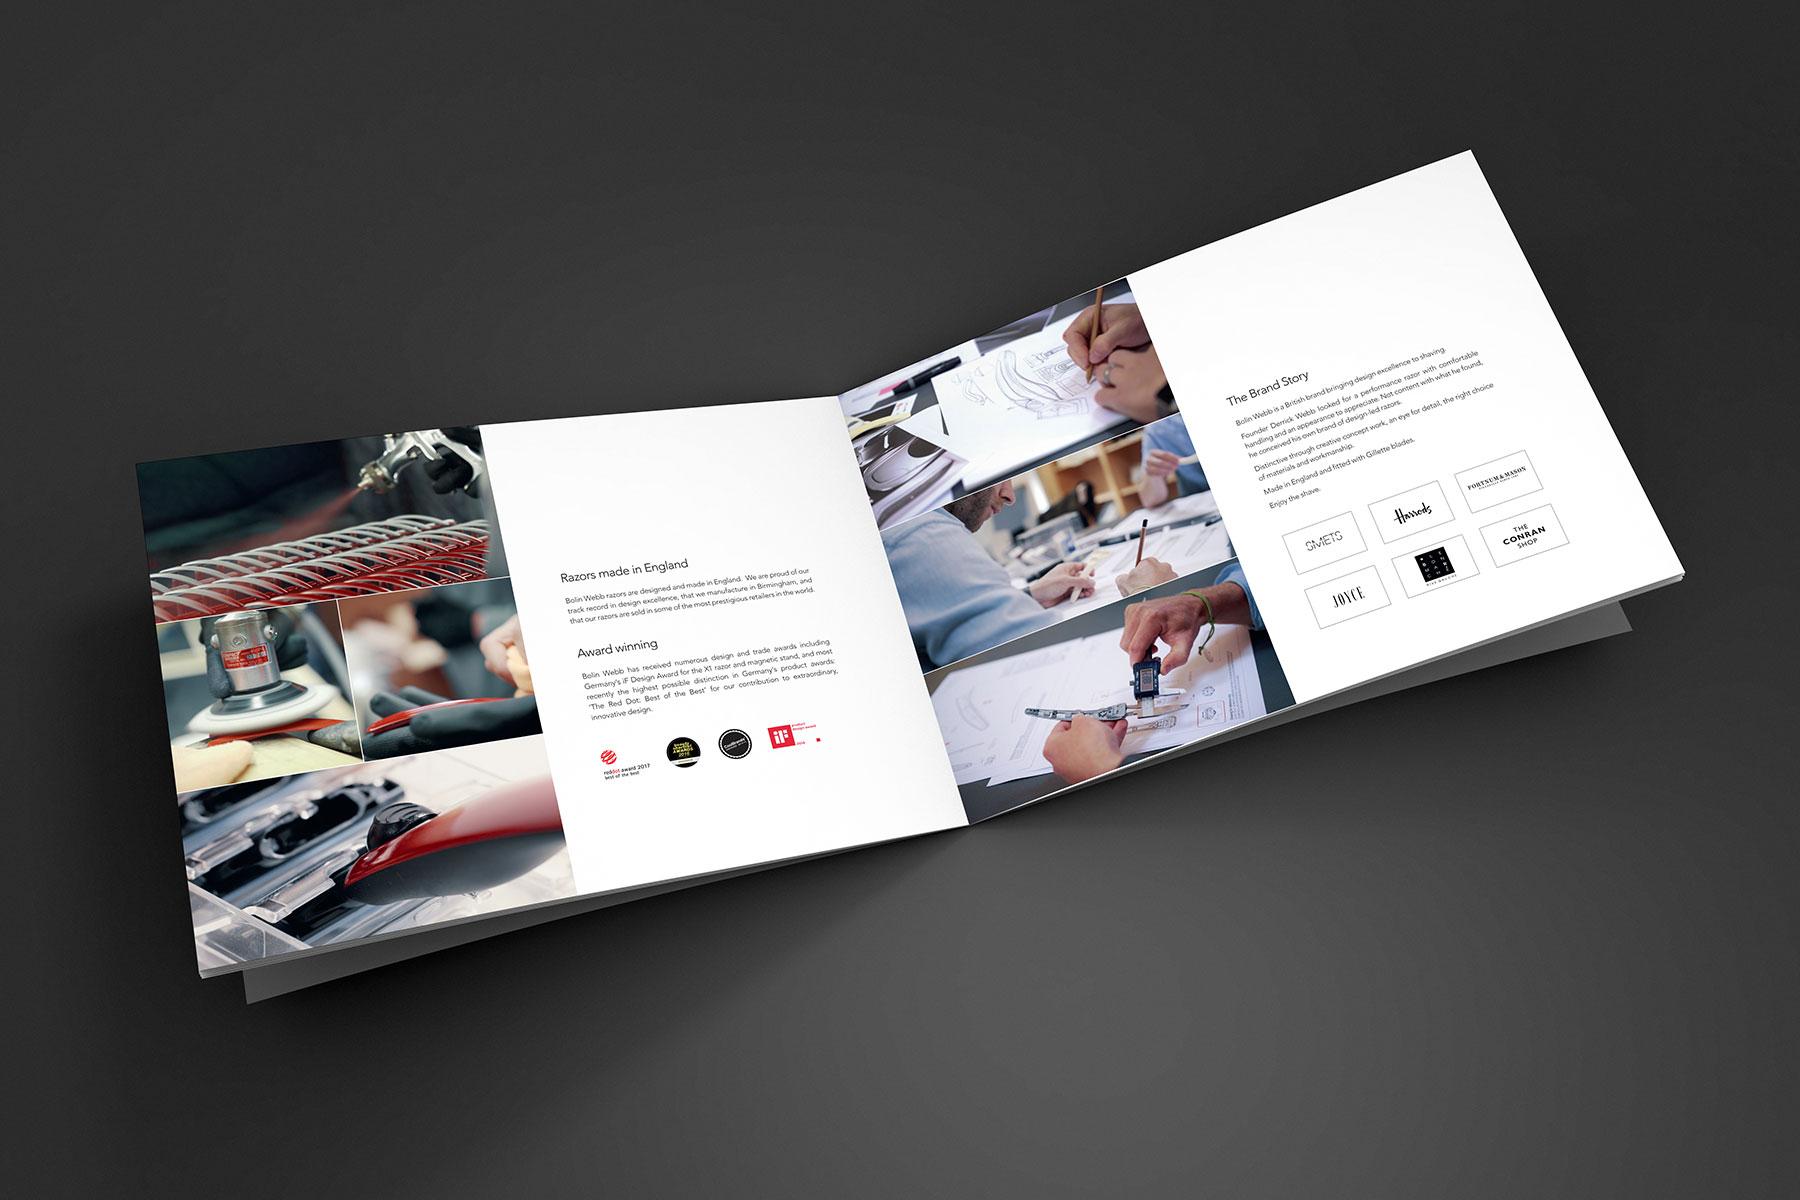 Brochure design pages for Bolin Webb branding